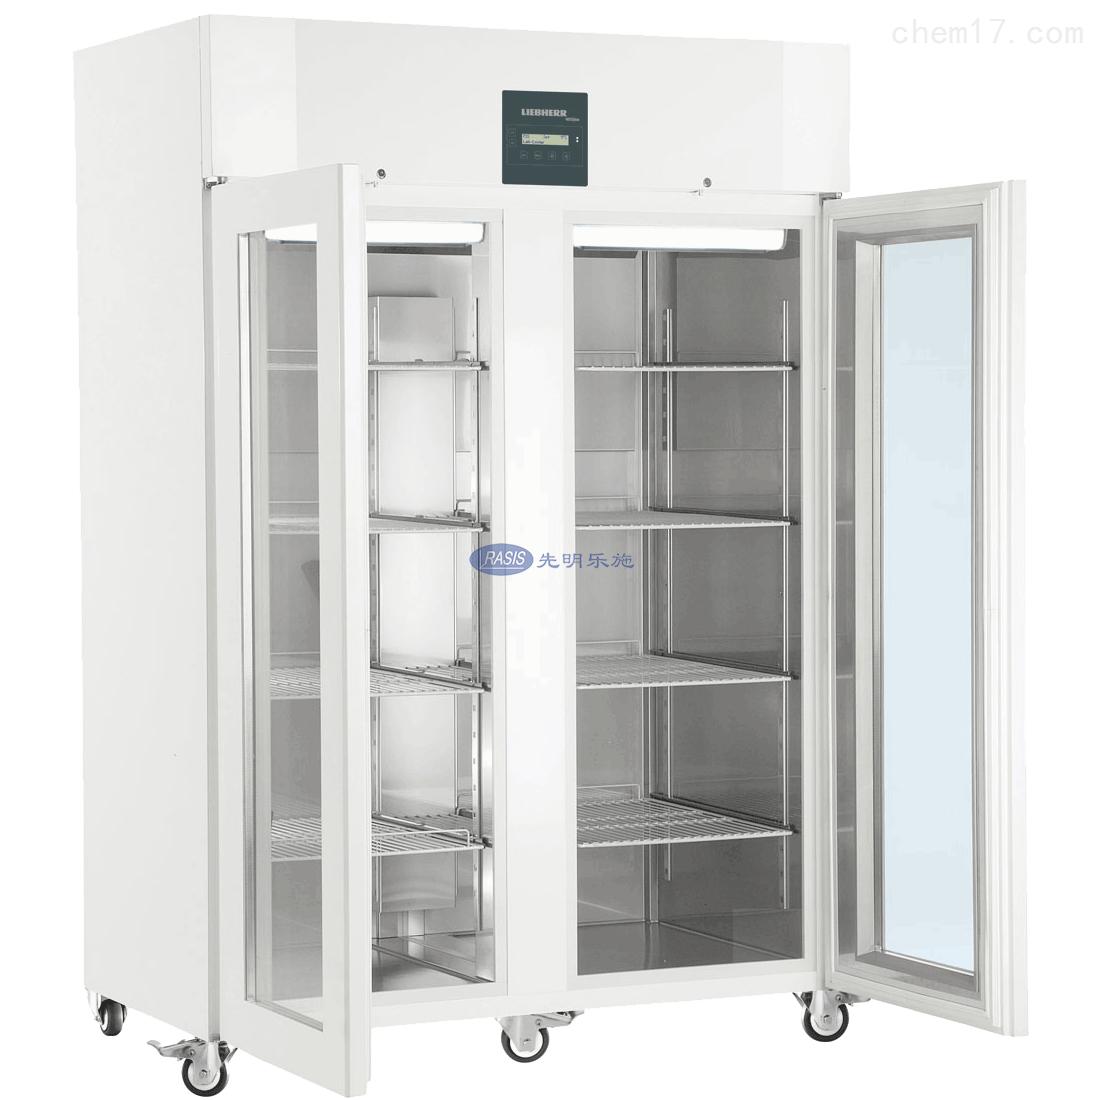 LKPv 1423旗舰型冷藏冰箱